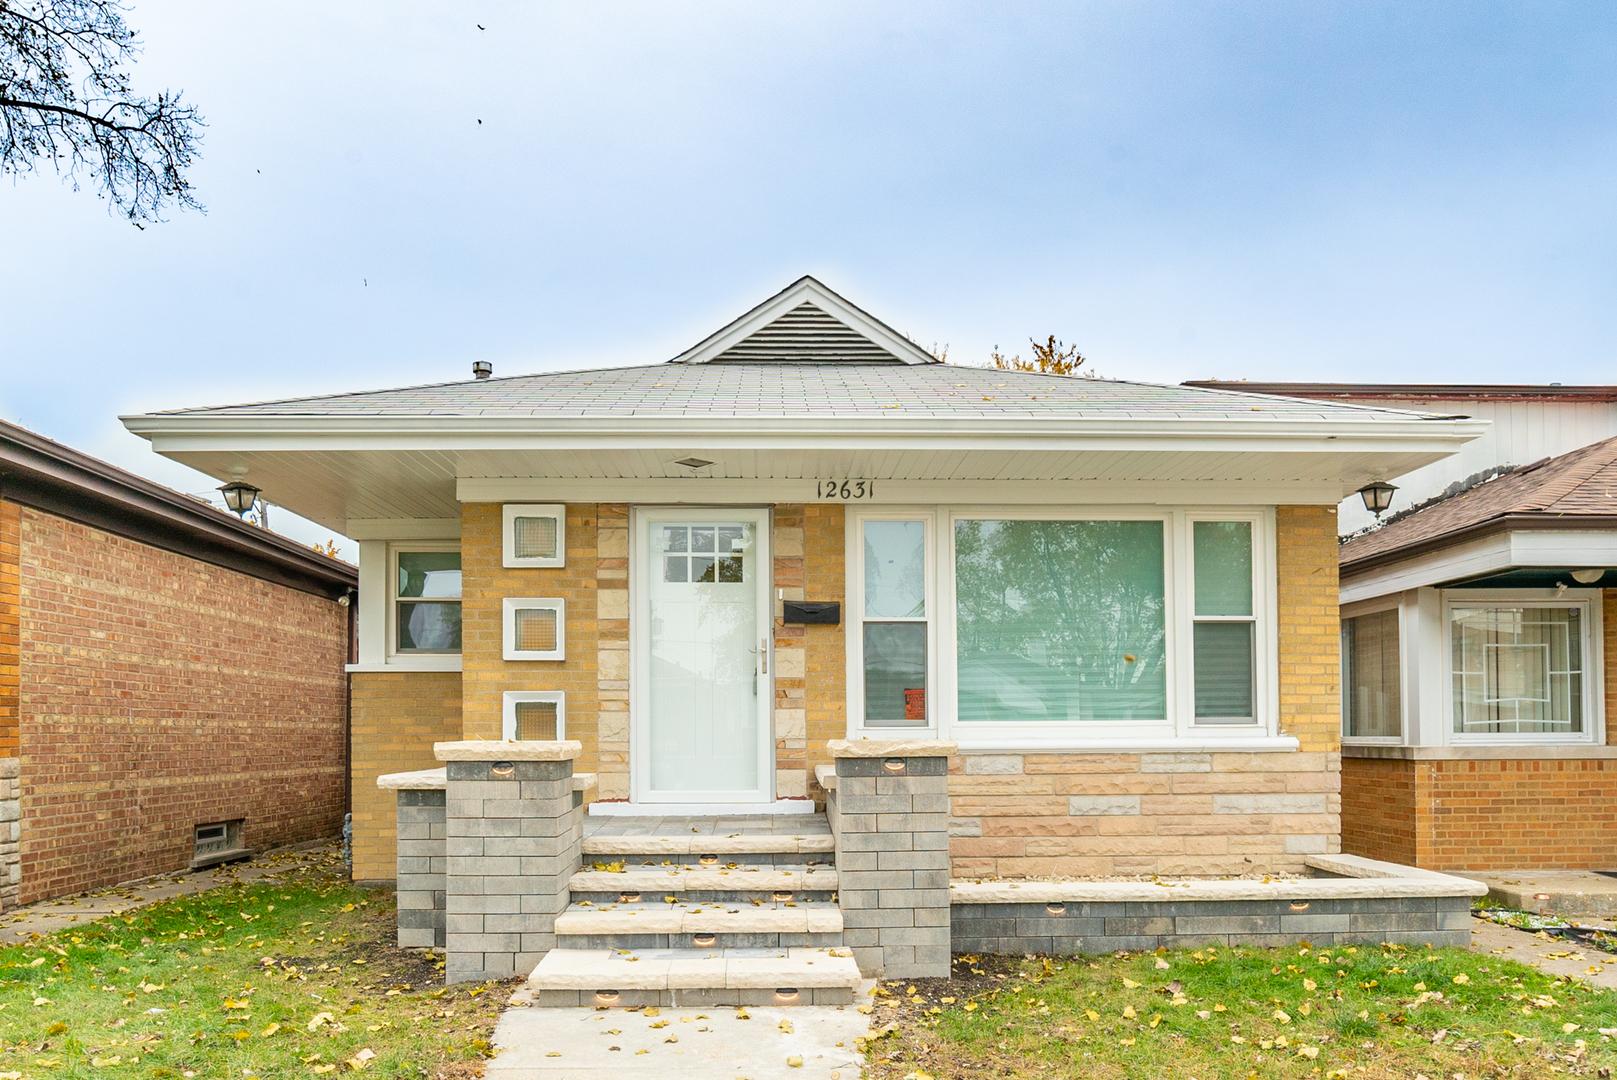 12631 Laflin ,Calumet Park, Illinois 60827